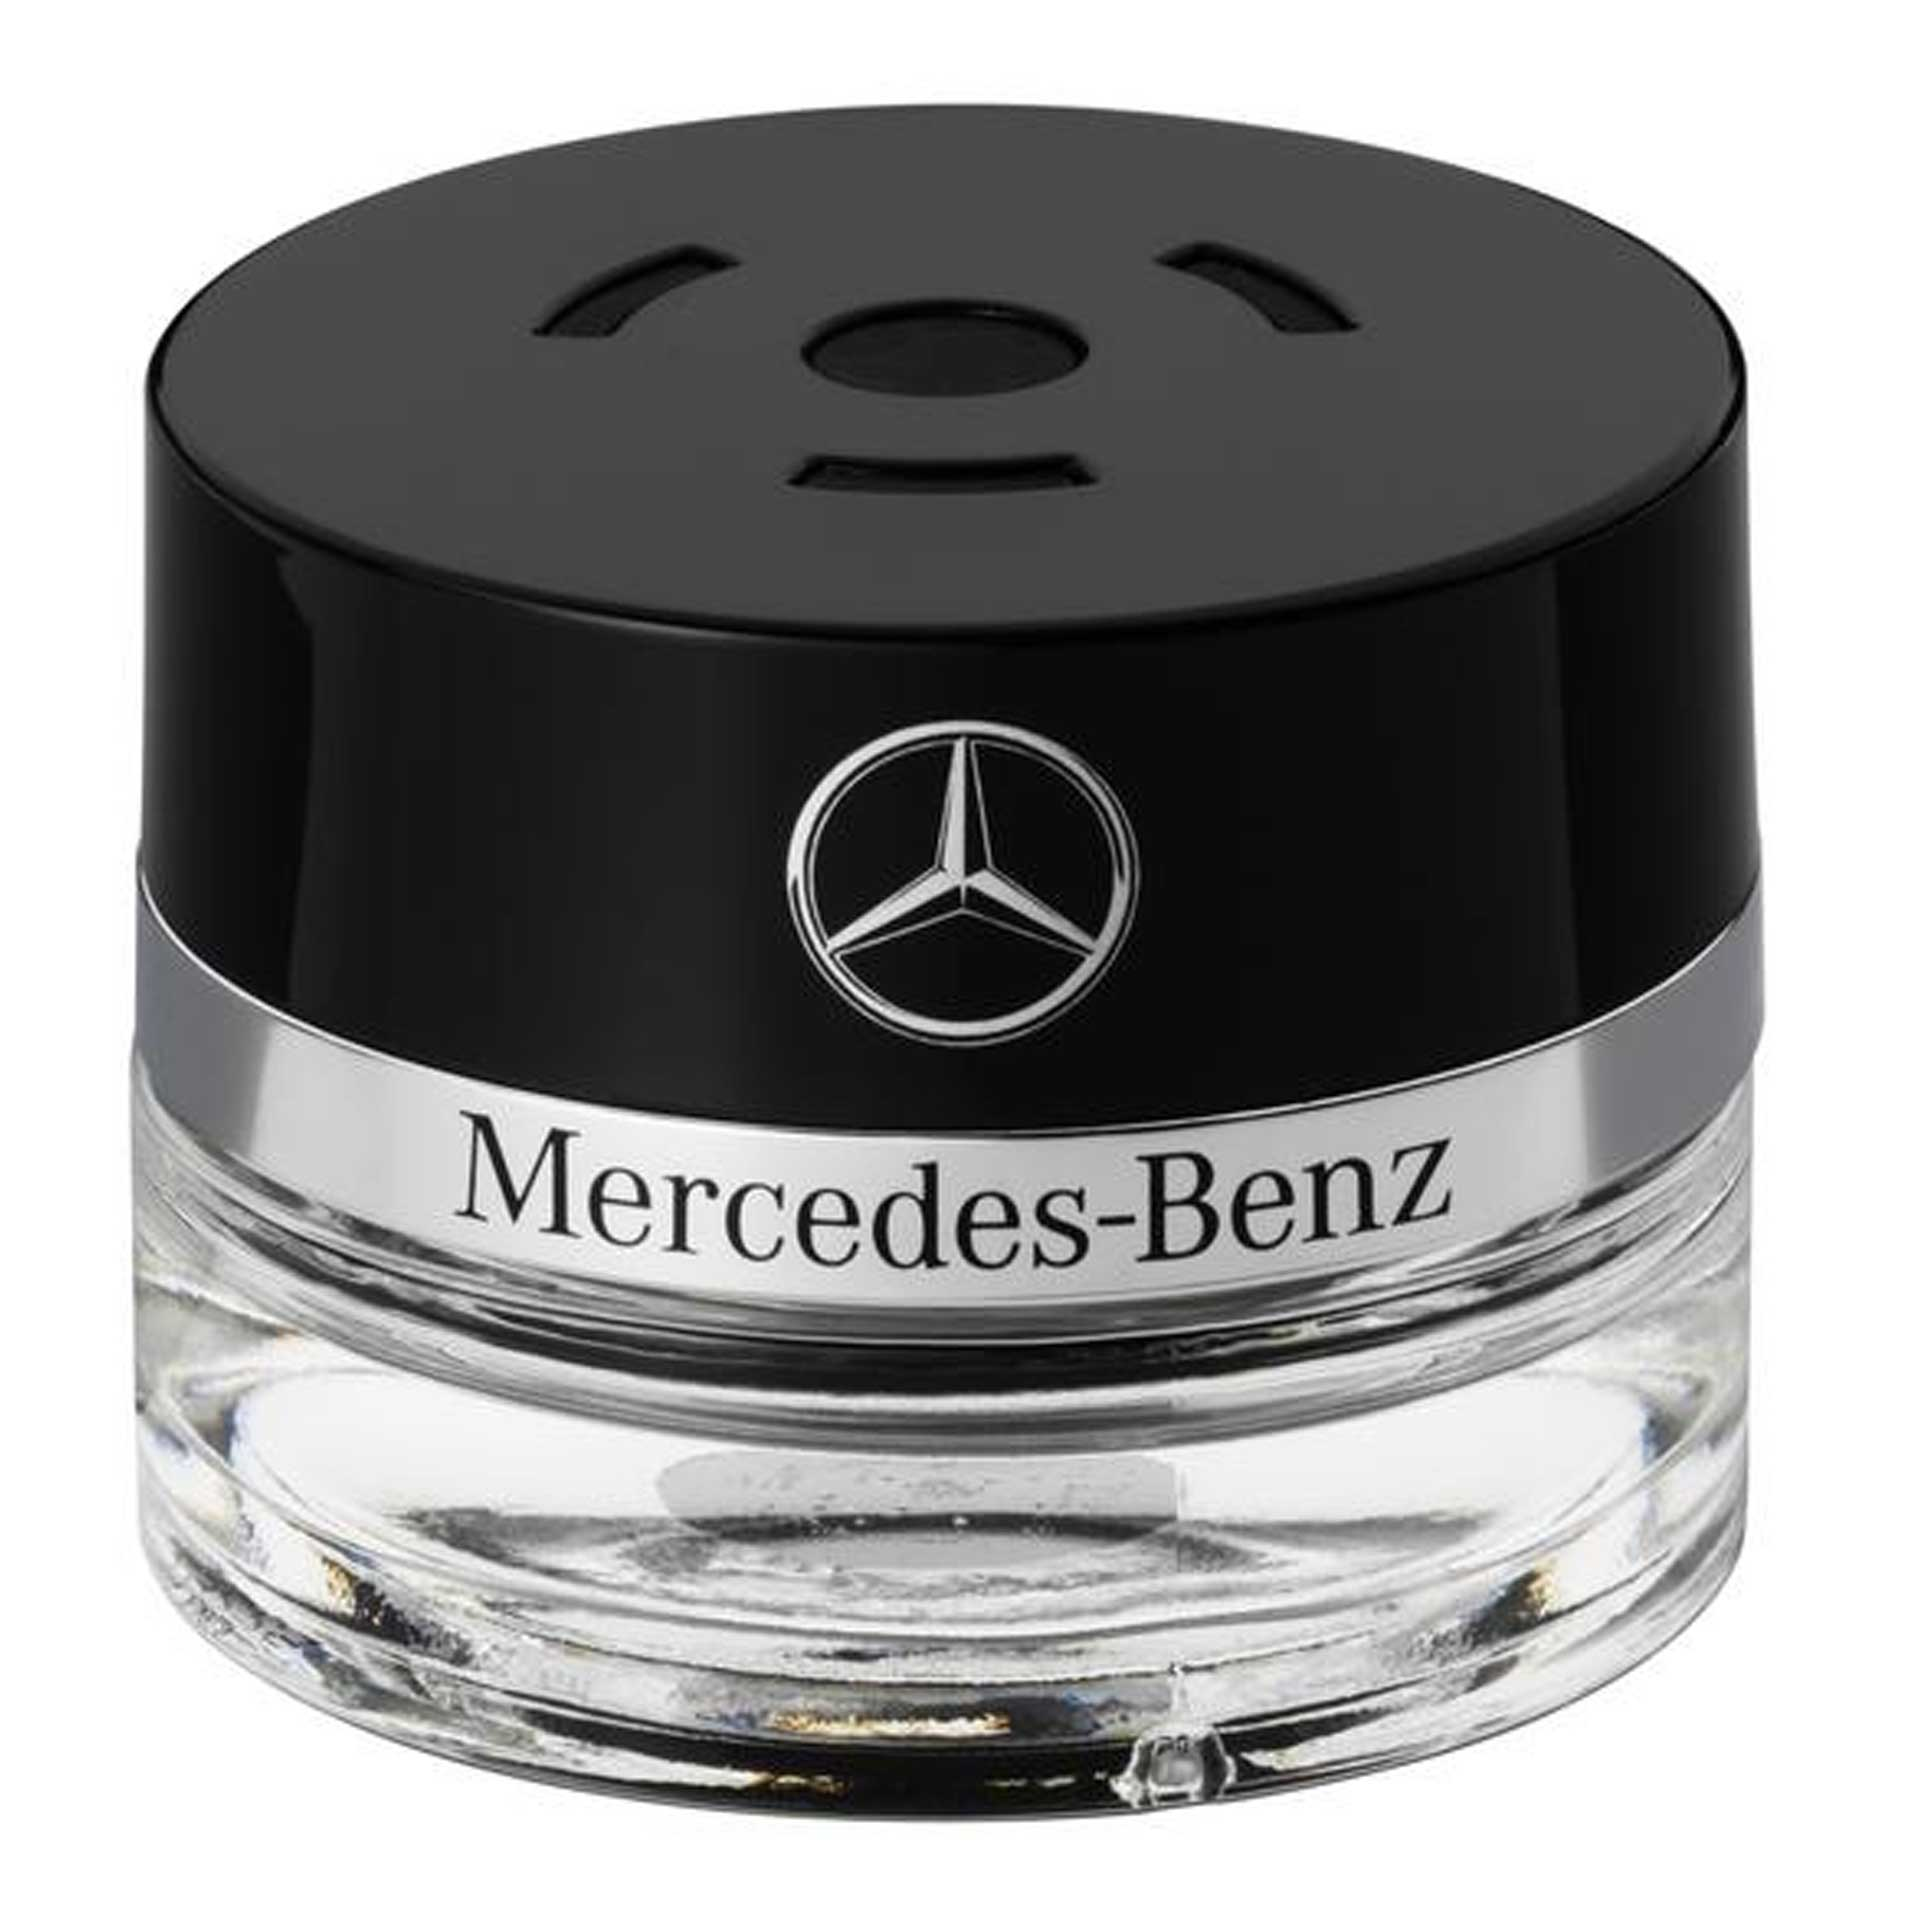 Mercedes-Benz Flakon 15 ml BAMBOO MOOD  für AIR-BALANCE Paket